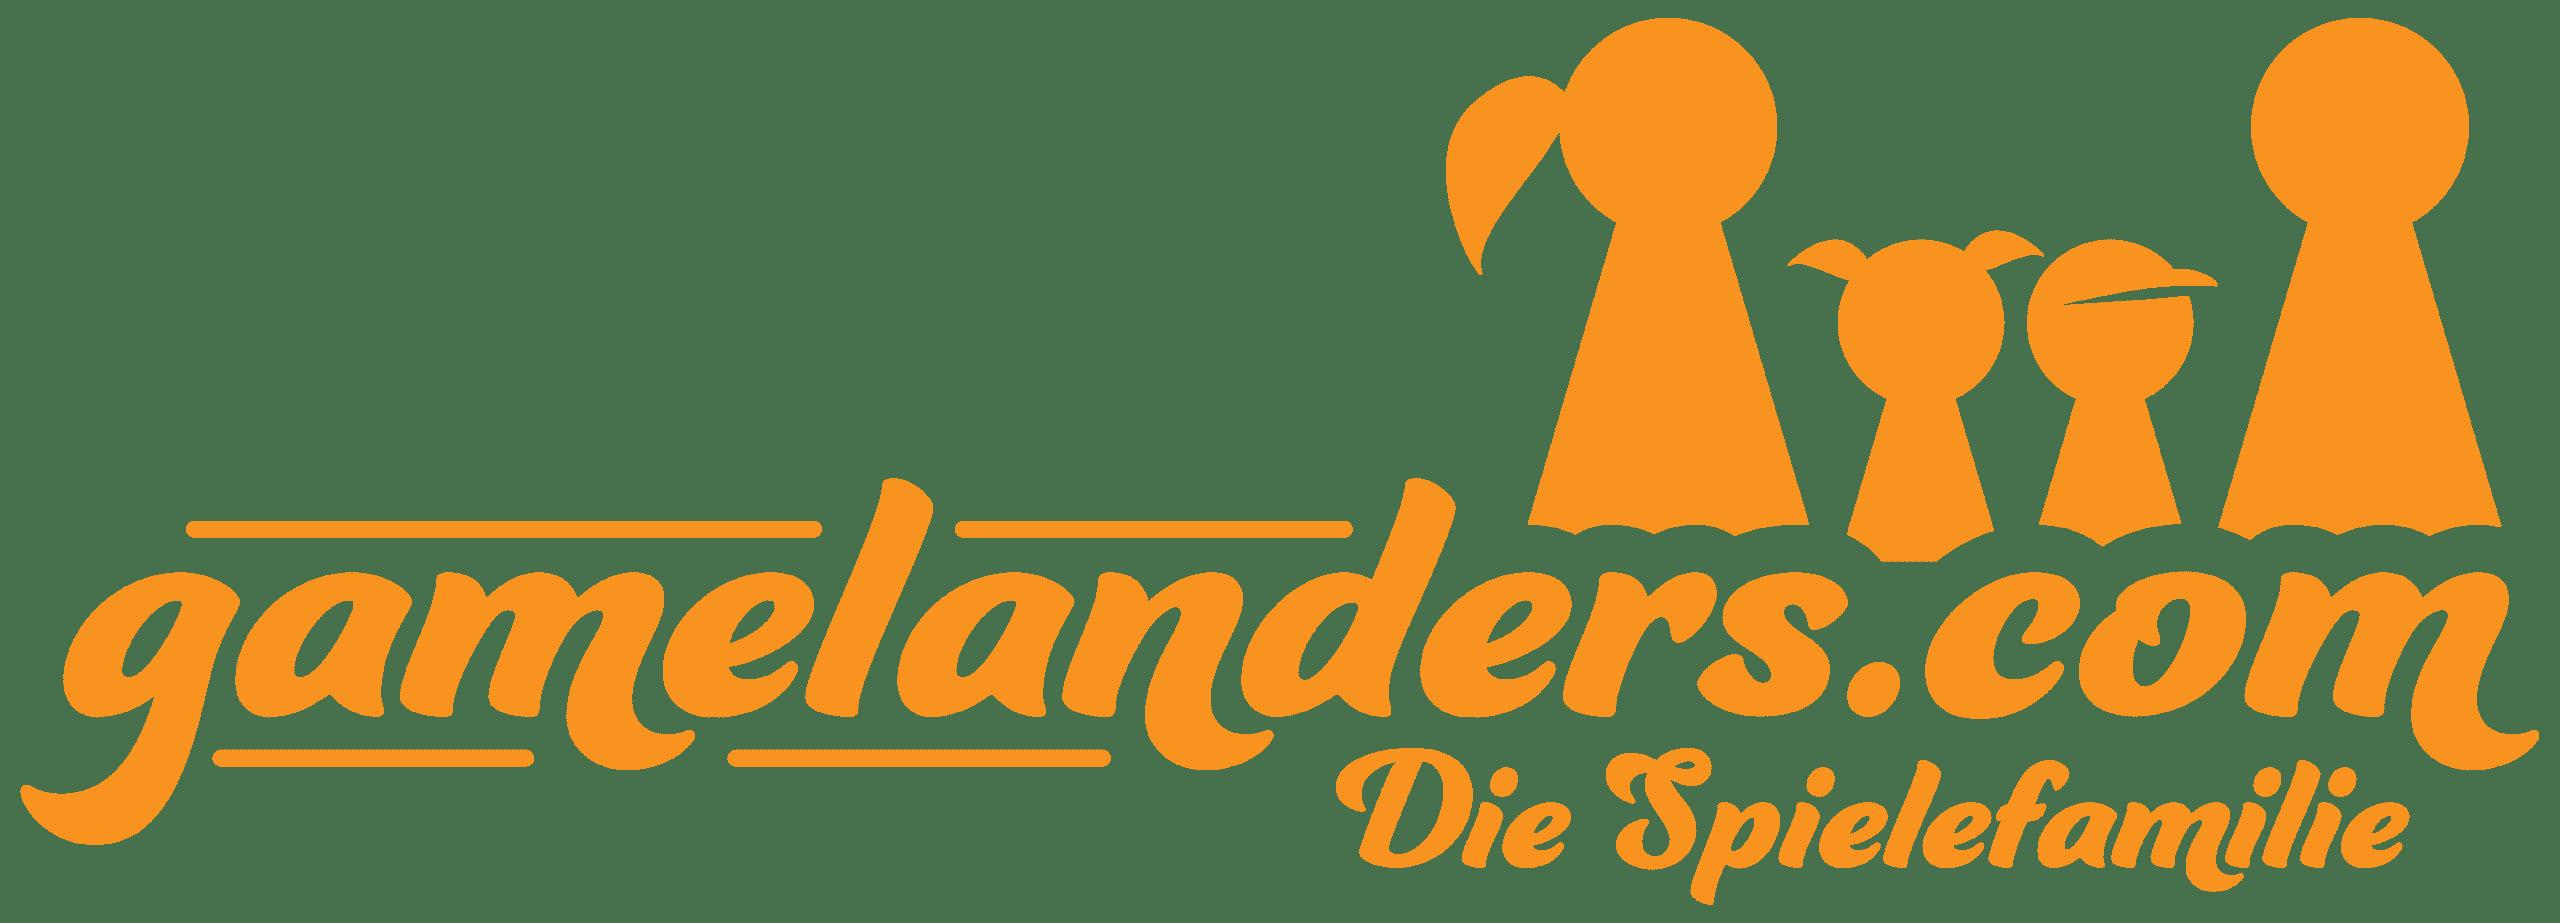 Gamelanders.com